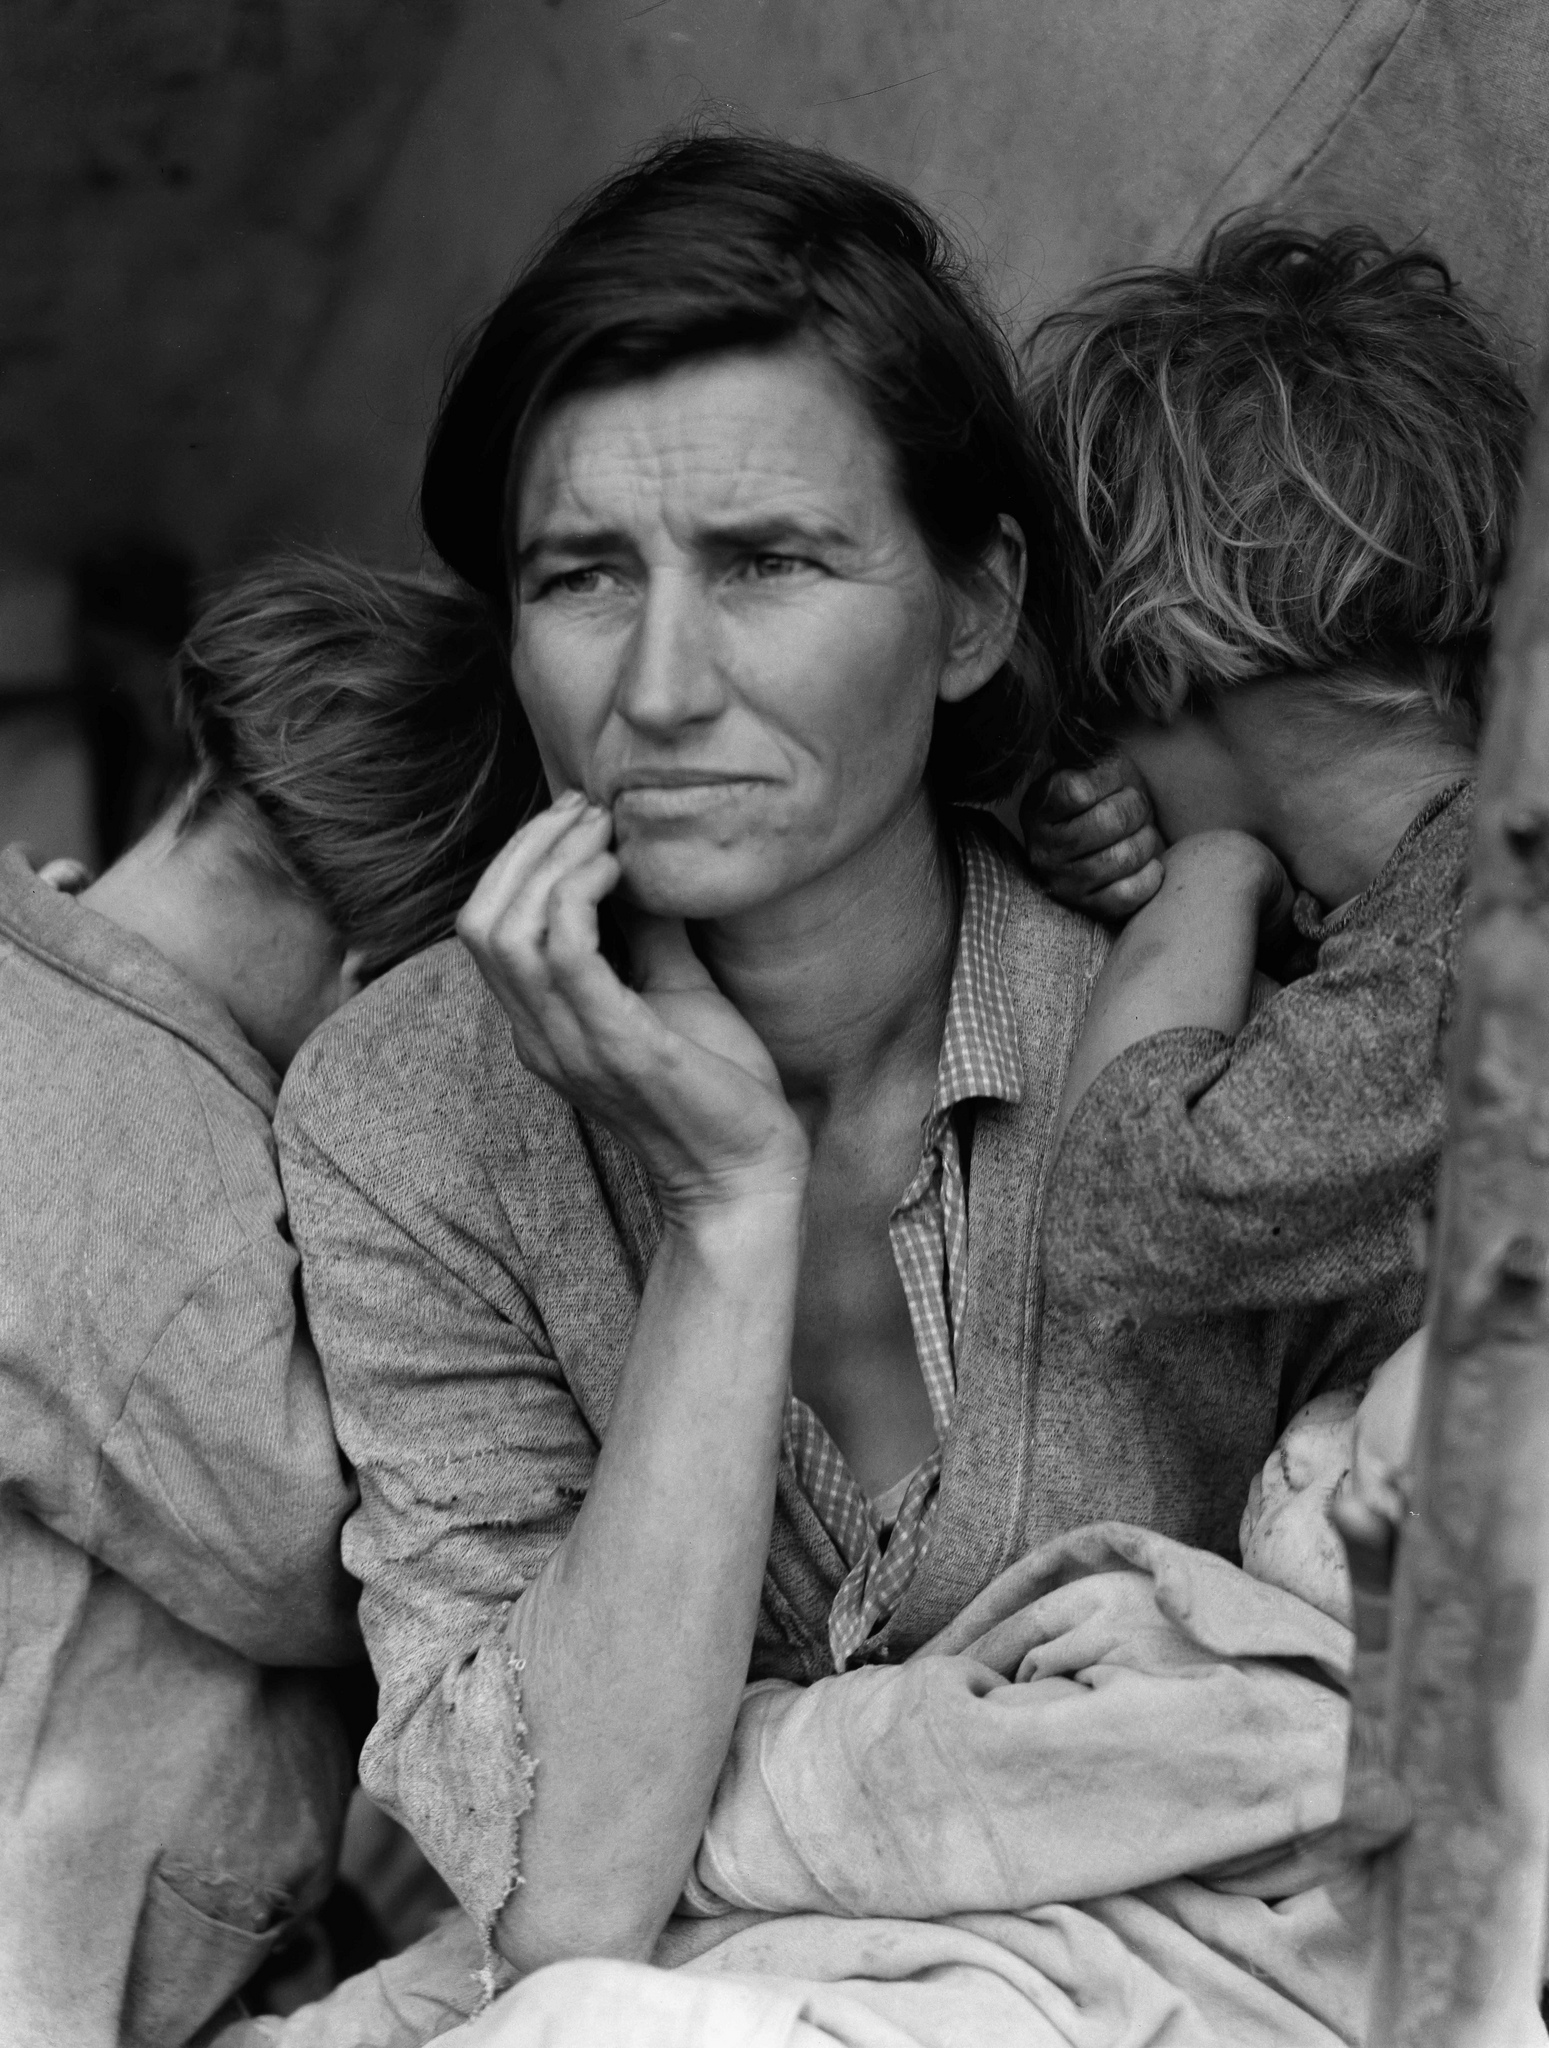 Migrant Mother | © C. Thomas Anderson / Flickr